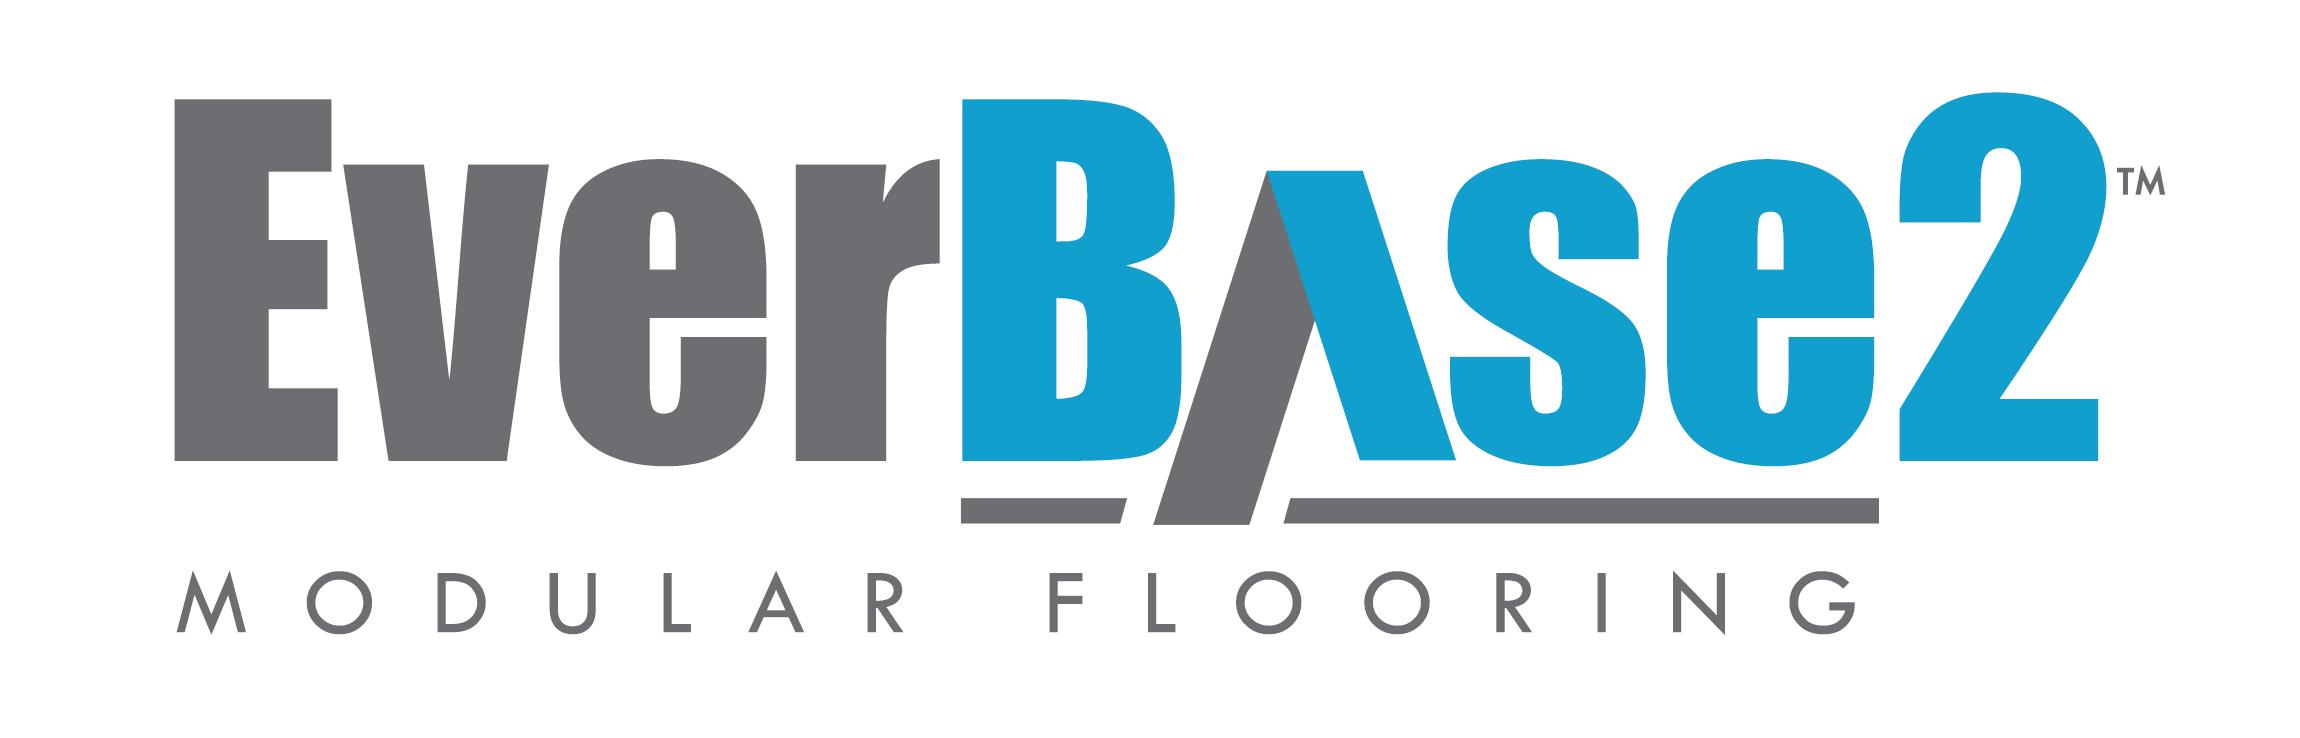 everbase 2 modular flooring tiles